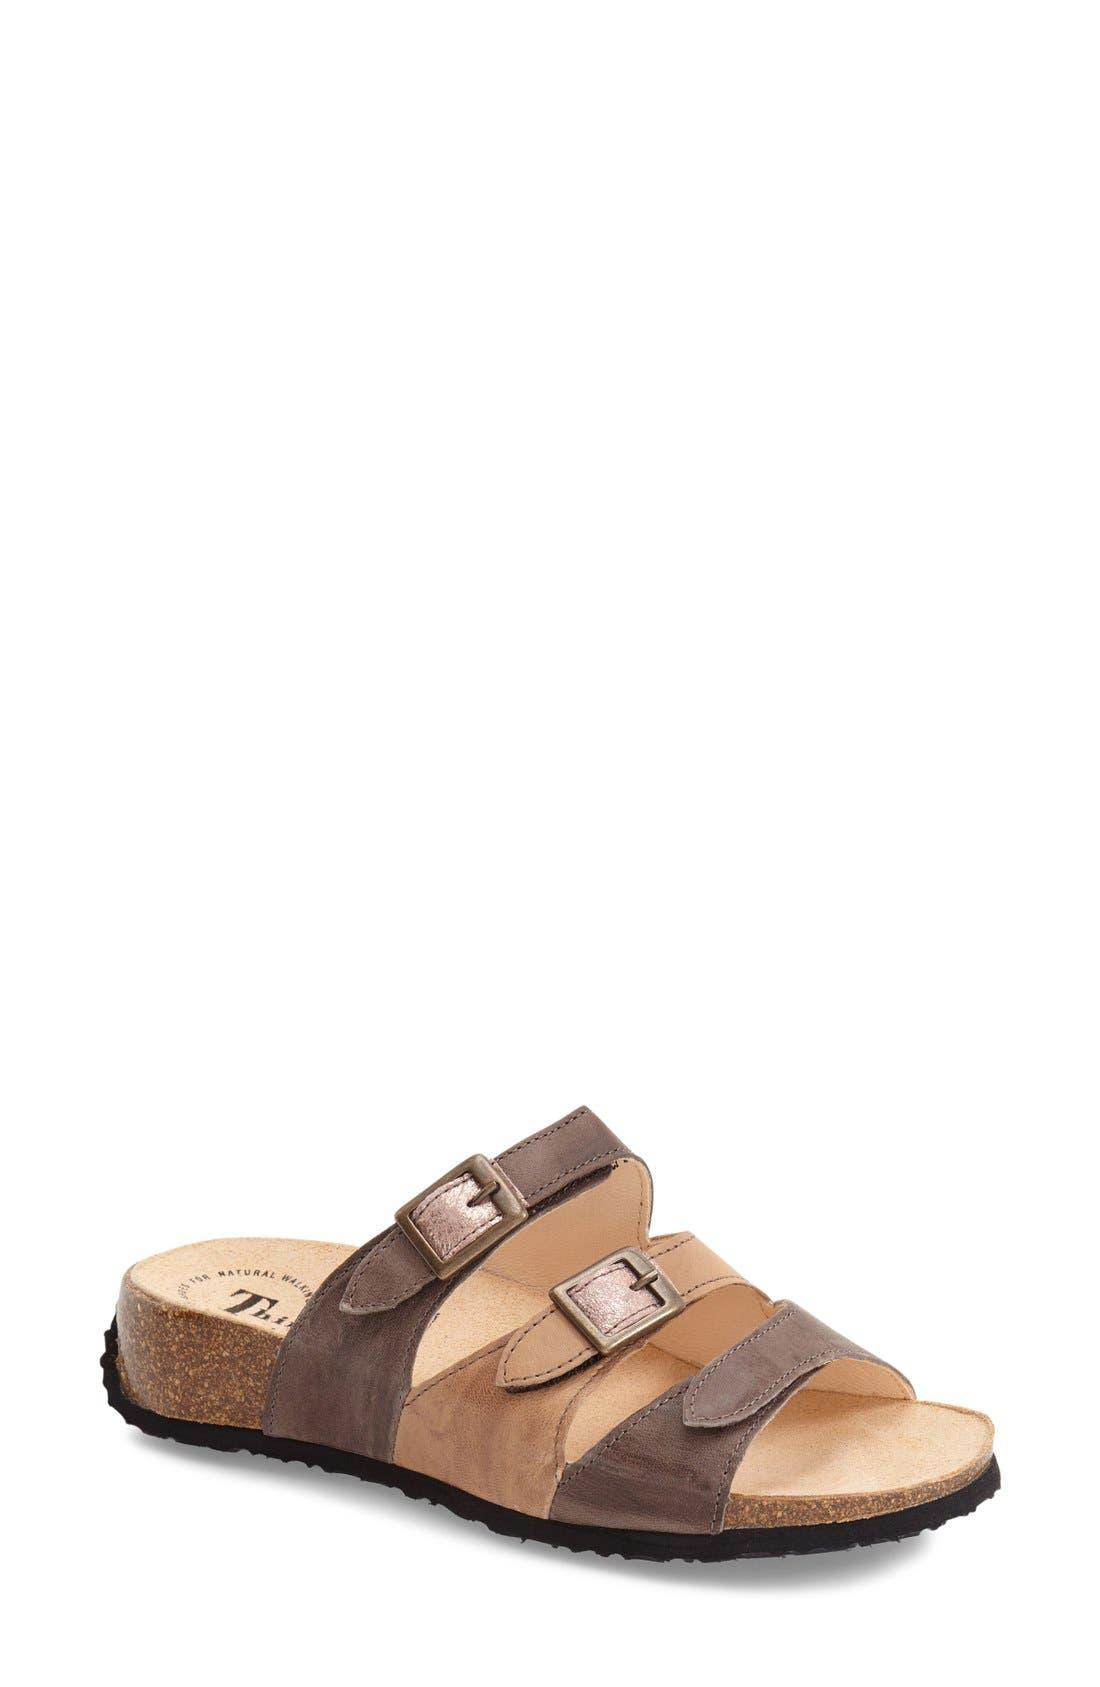 'Mizzi' Sandal,                         Main,                         color,